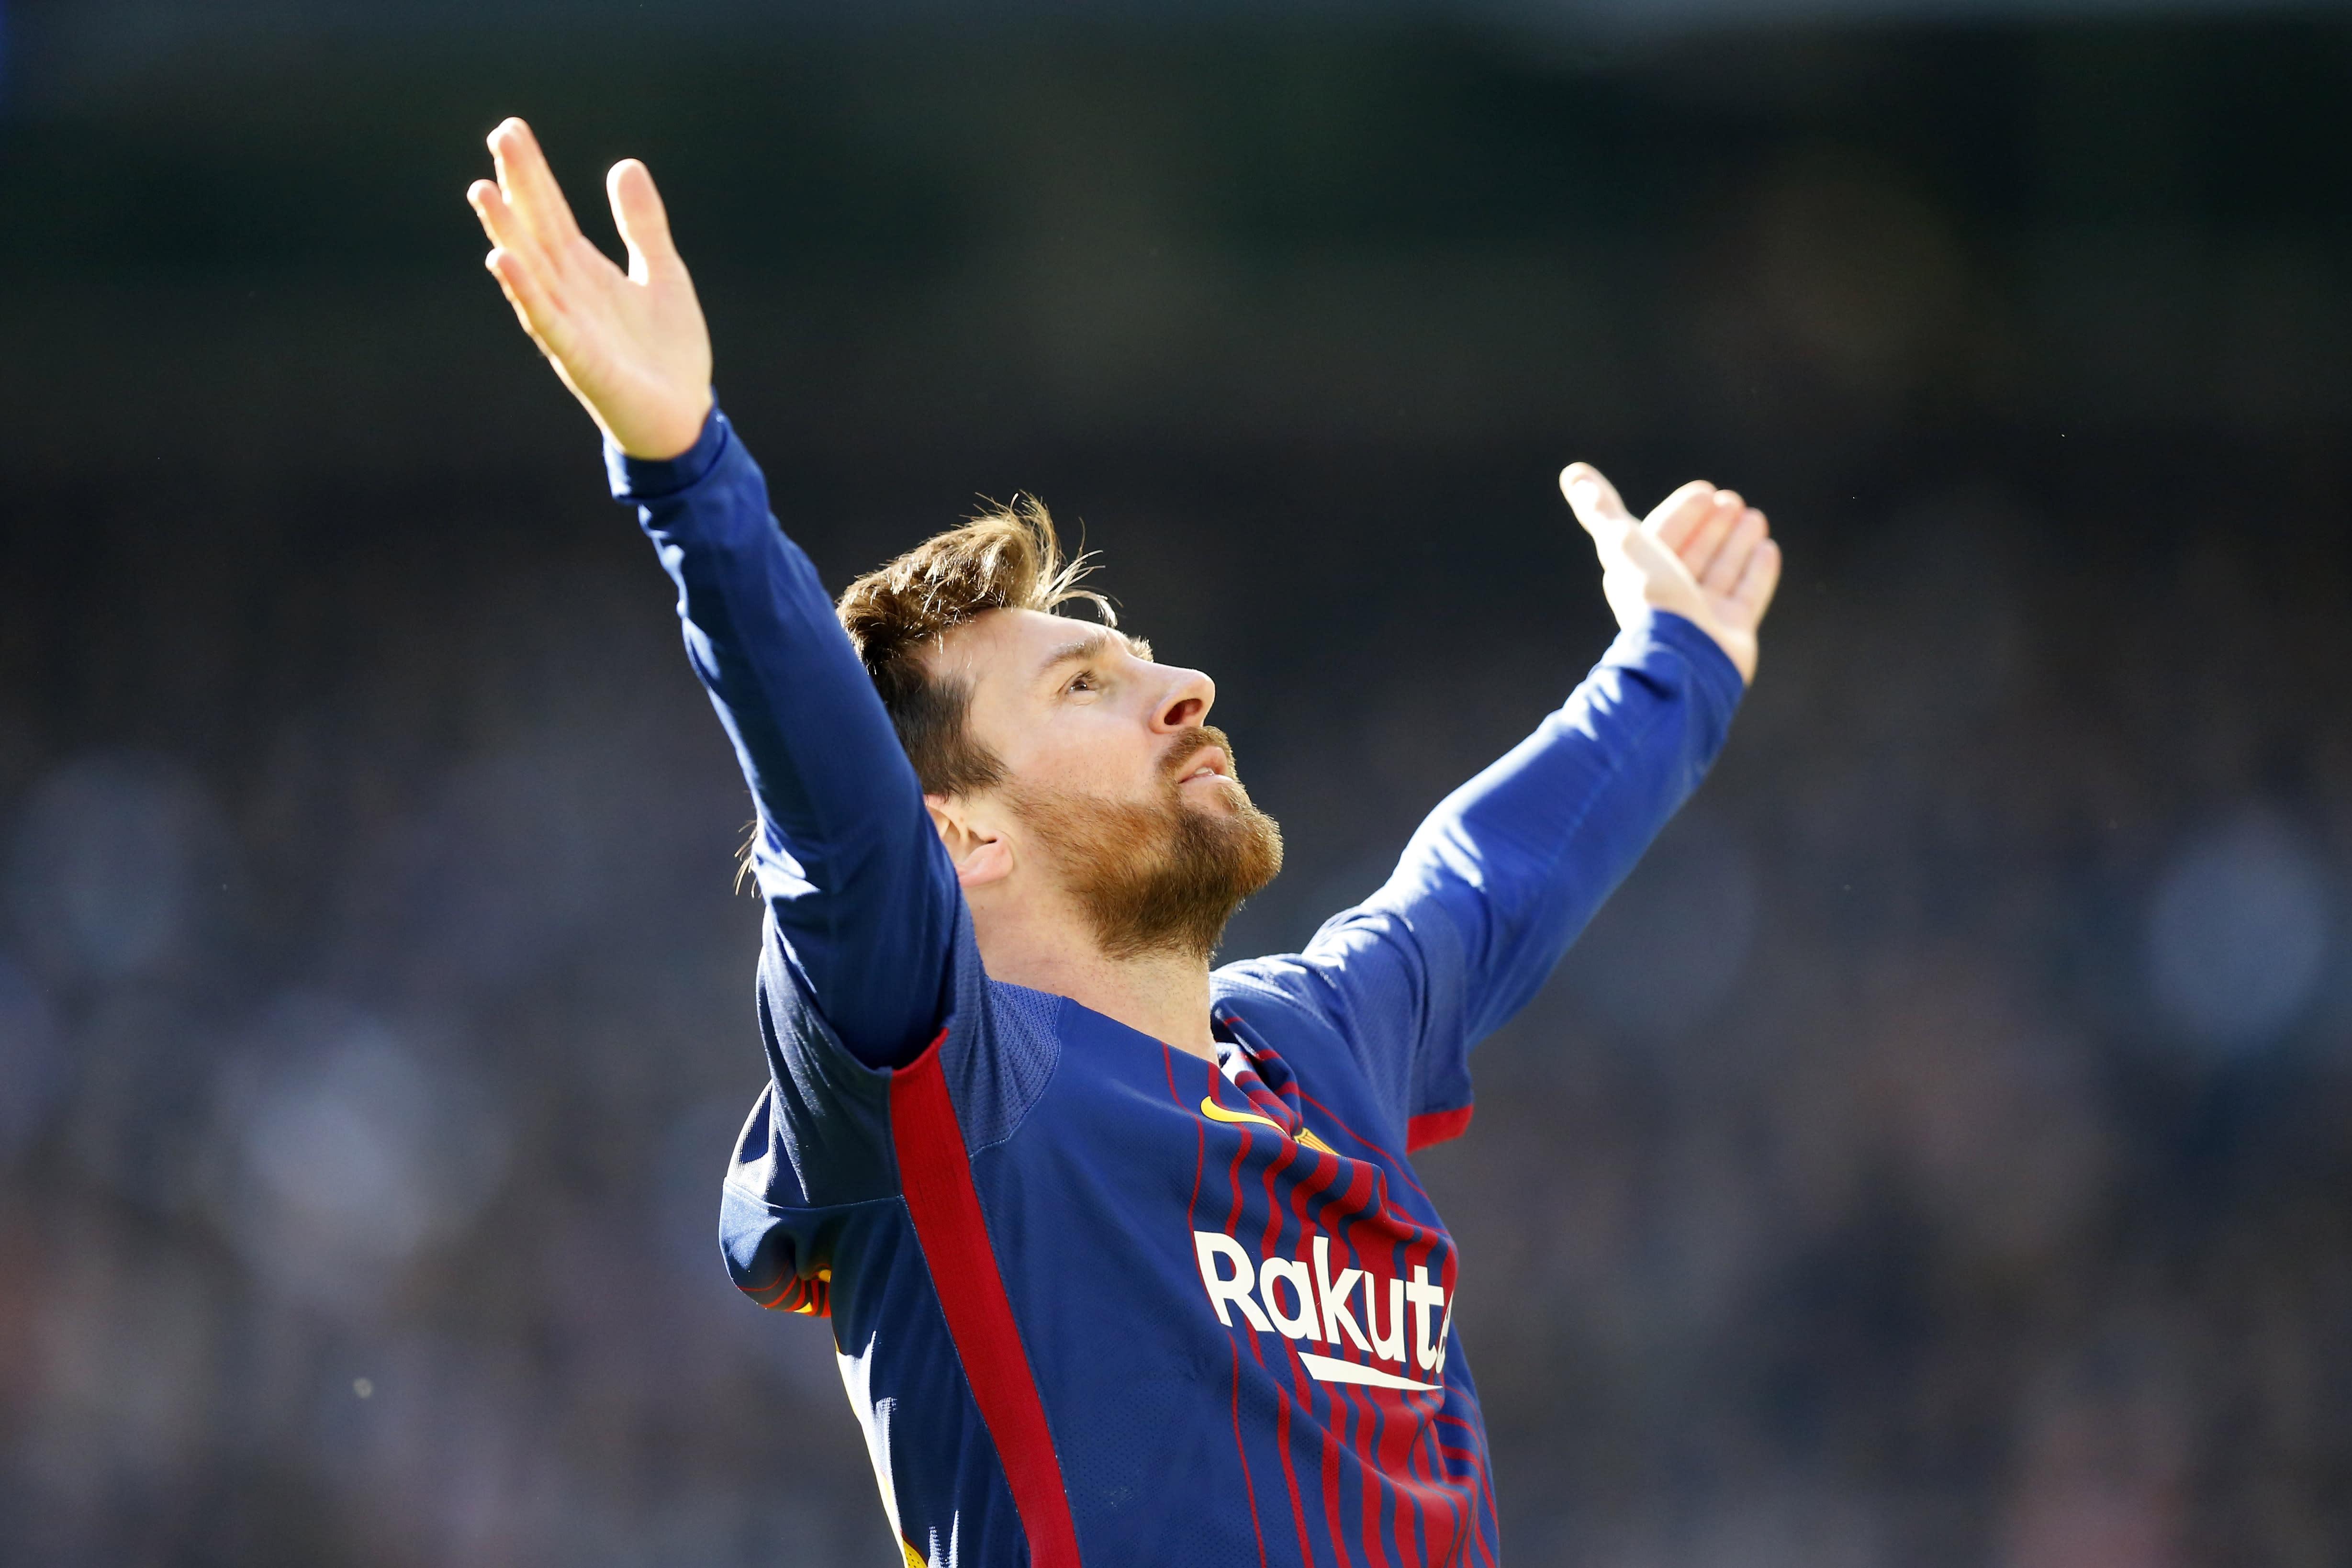 Lionel Messi creates Barcelona goal after losing shoe